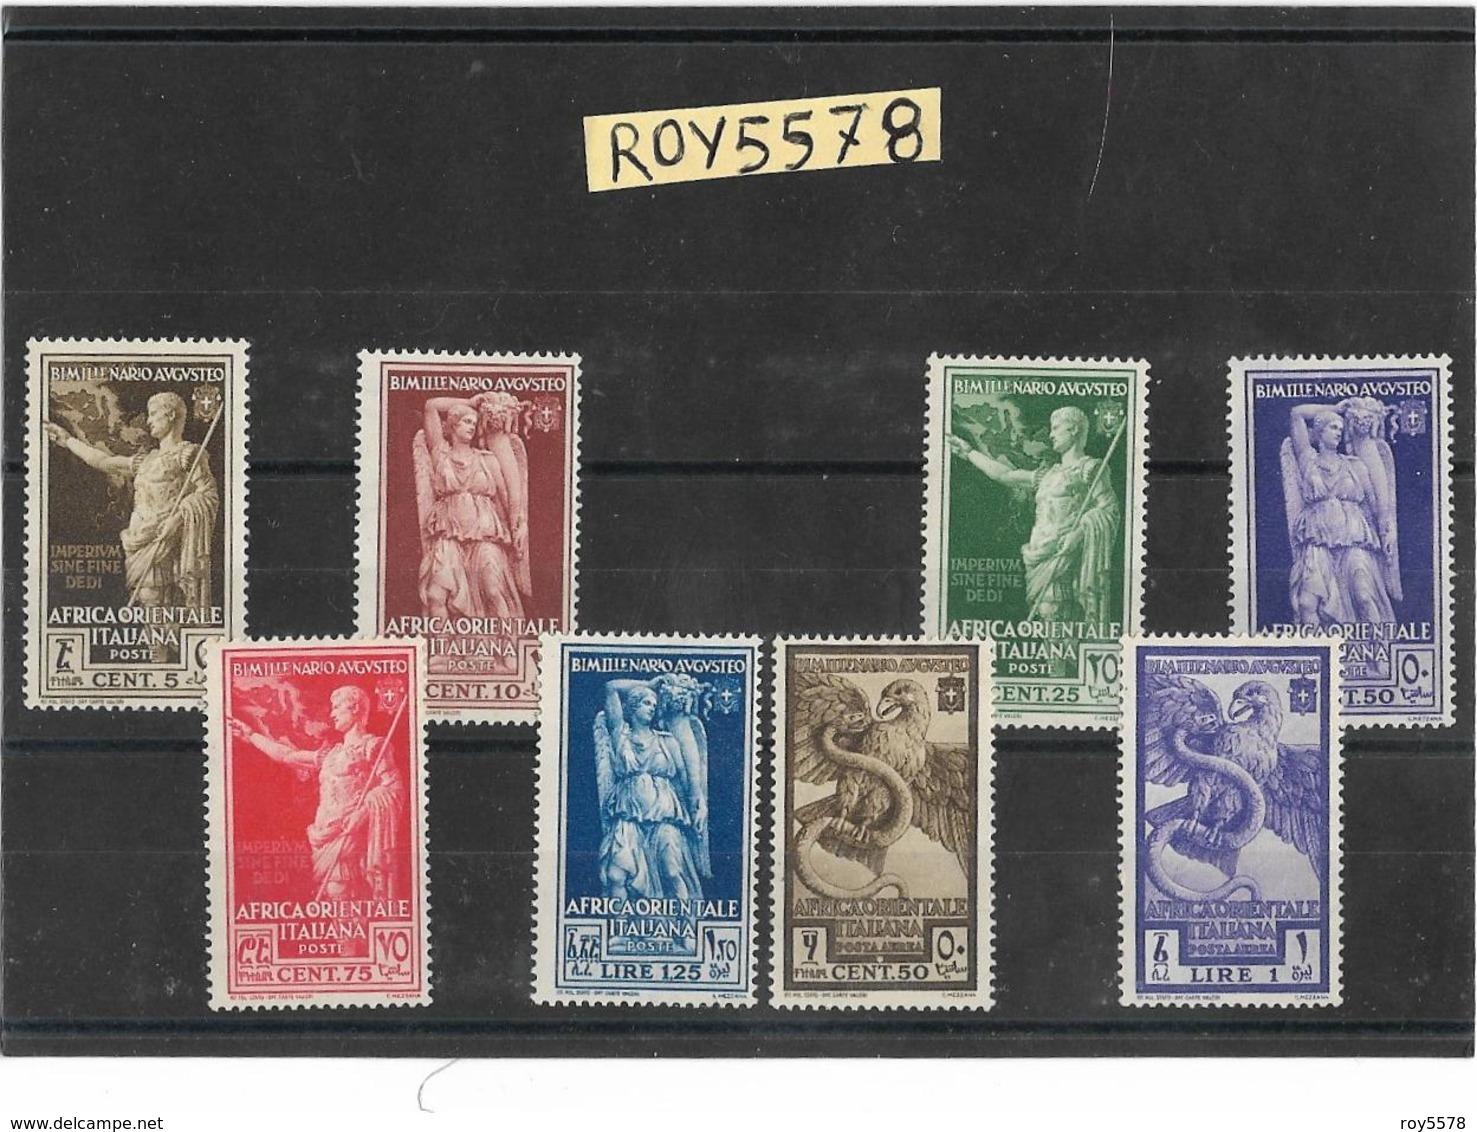 Francobollo Stamps Francobolli Colonie Italiane Africa Orientale Bimillenario Nascita Augusto 1938 ( Nuova V.retro) - Africa Orientale Italiana